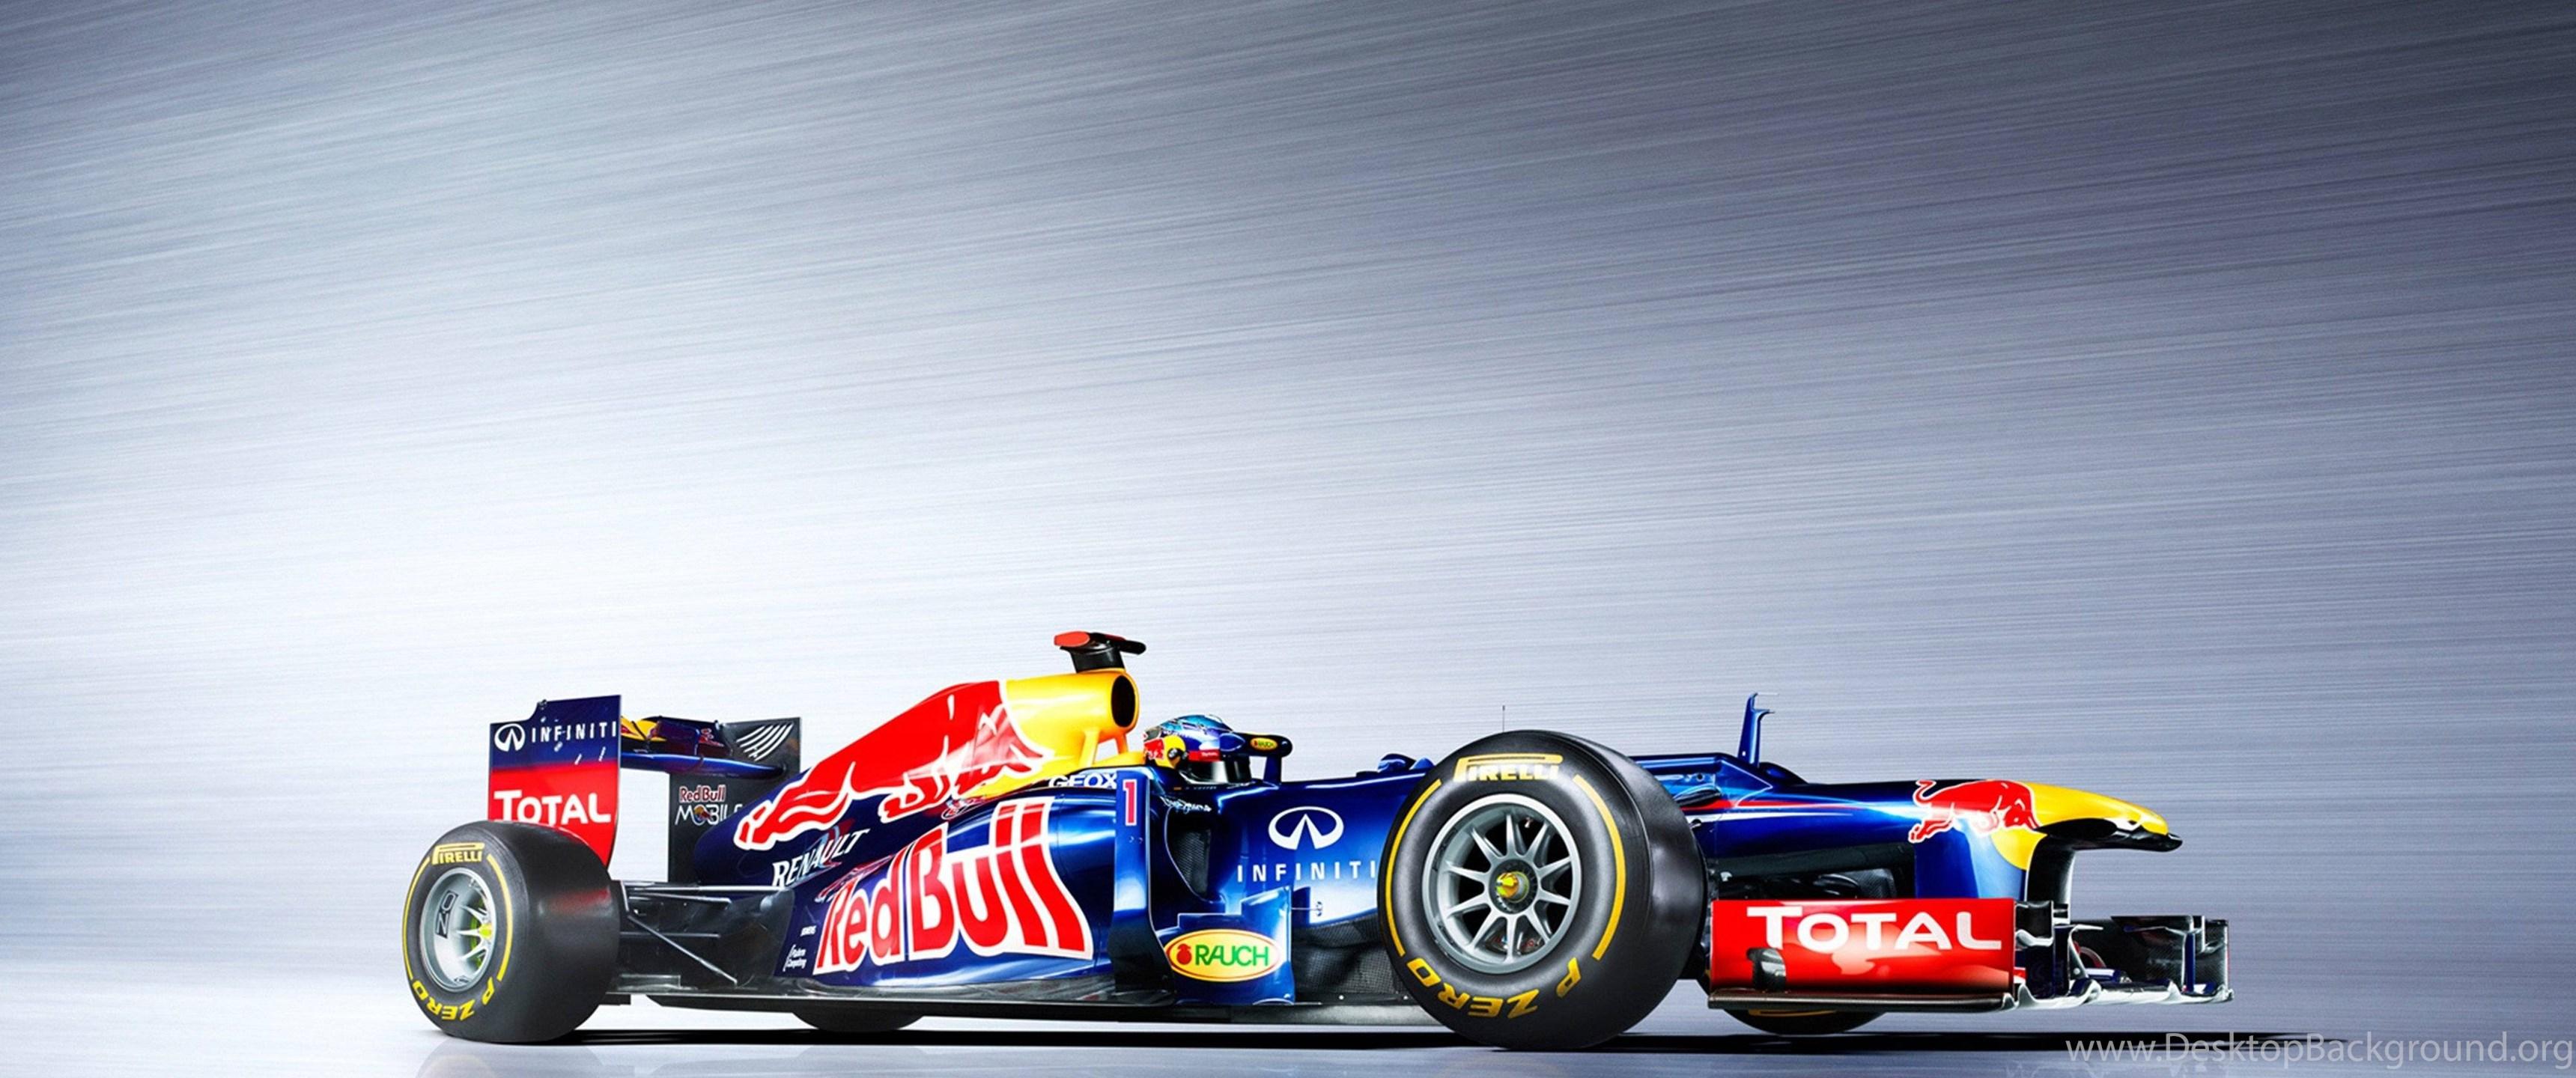 Ferrari Formula 1 Hd Wallpapers Desktop Background